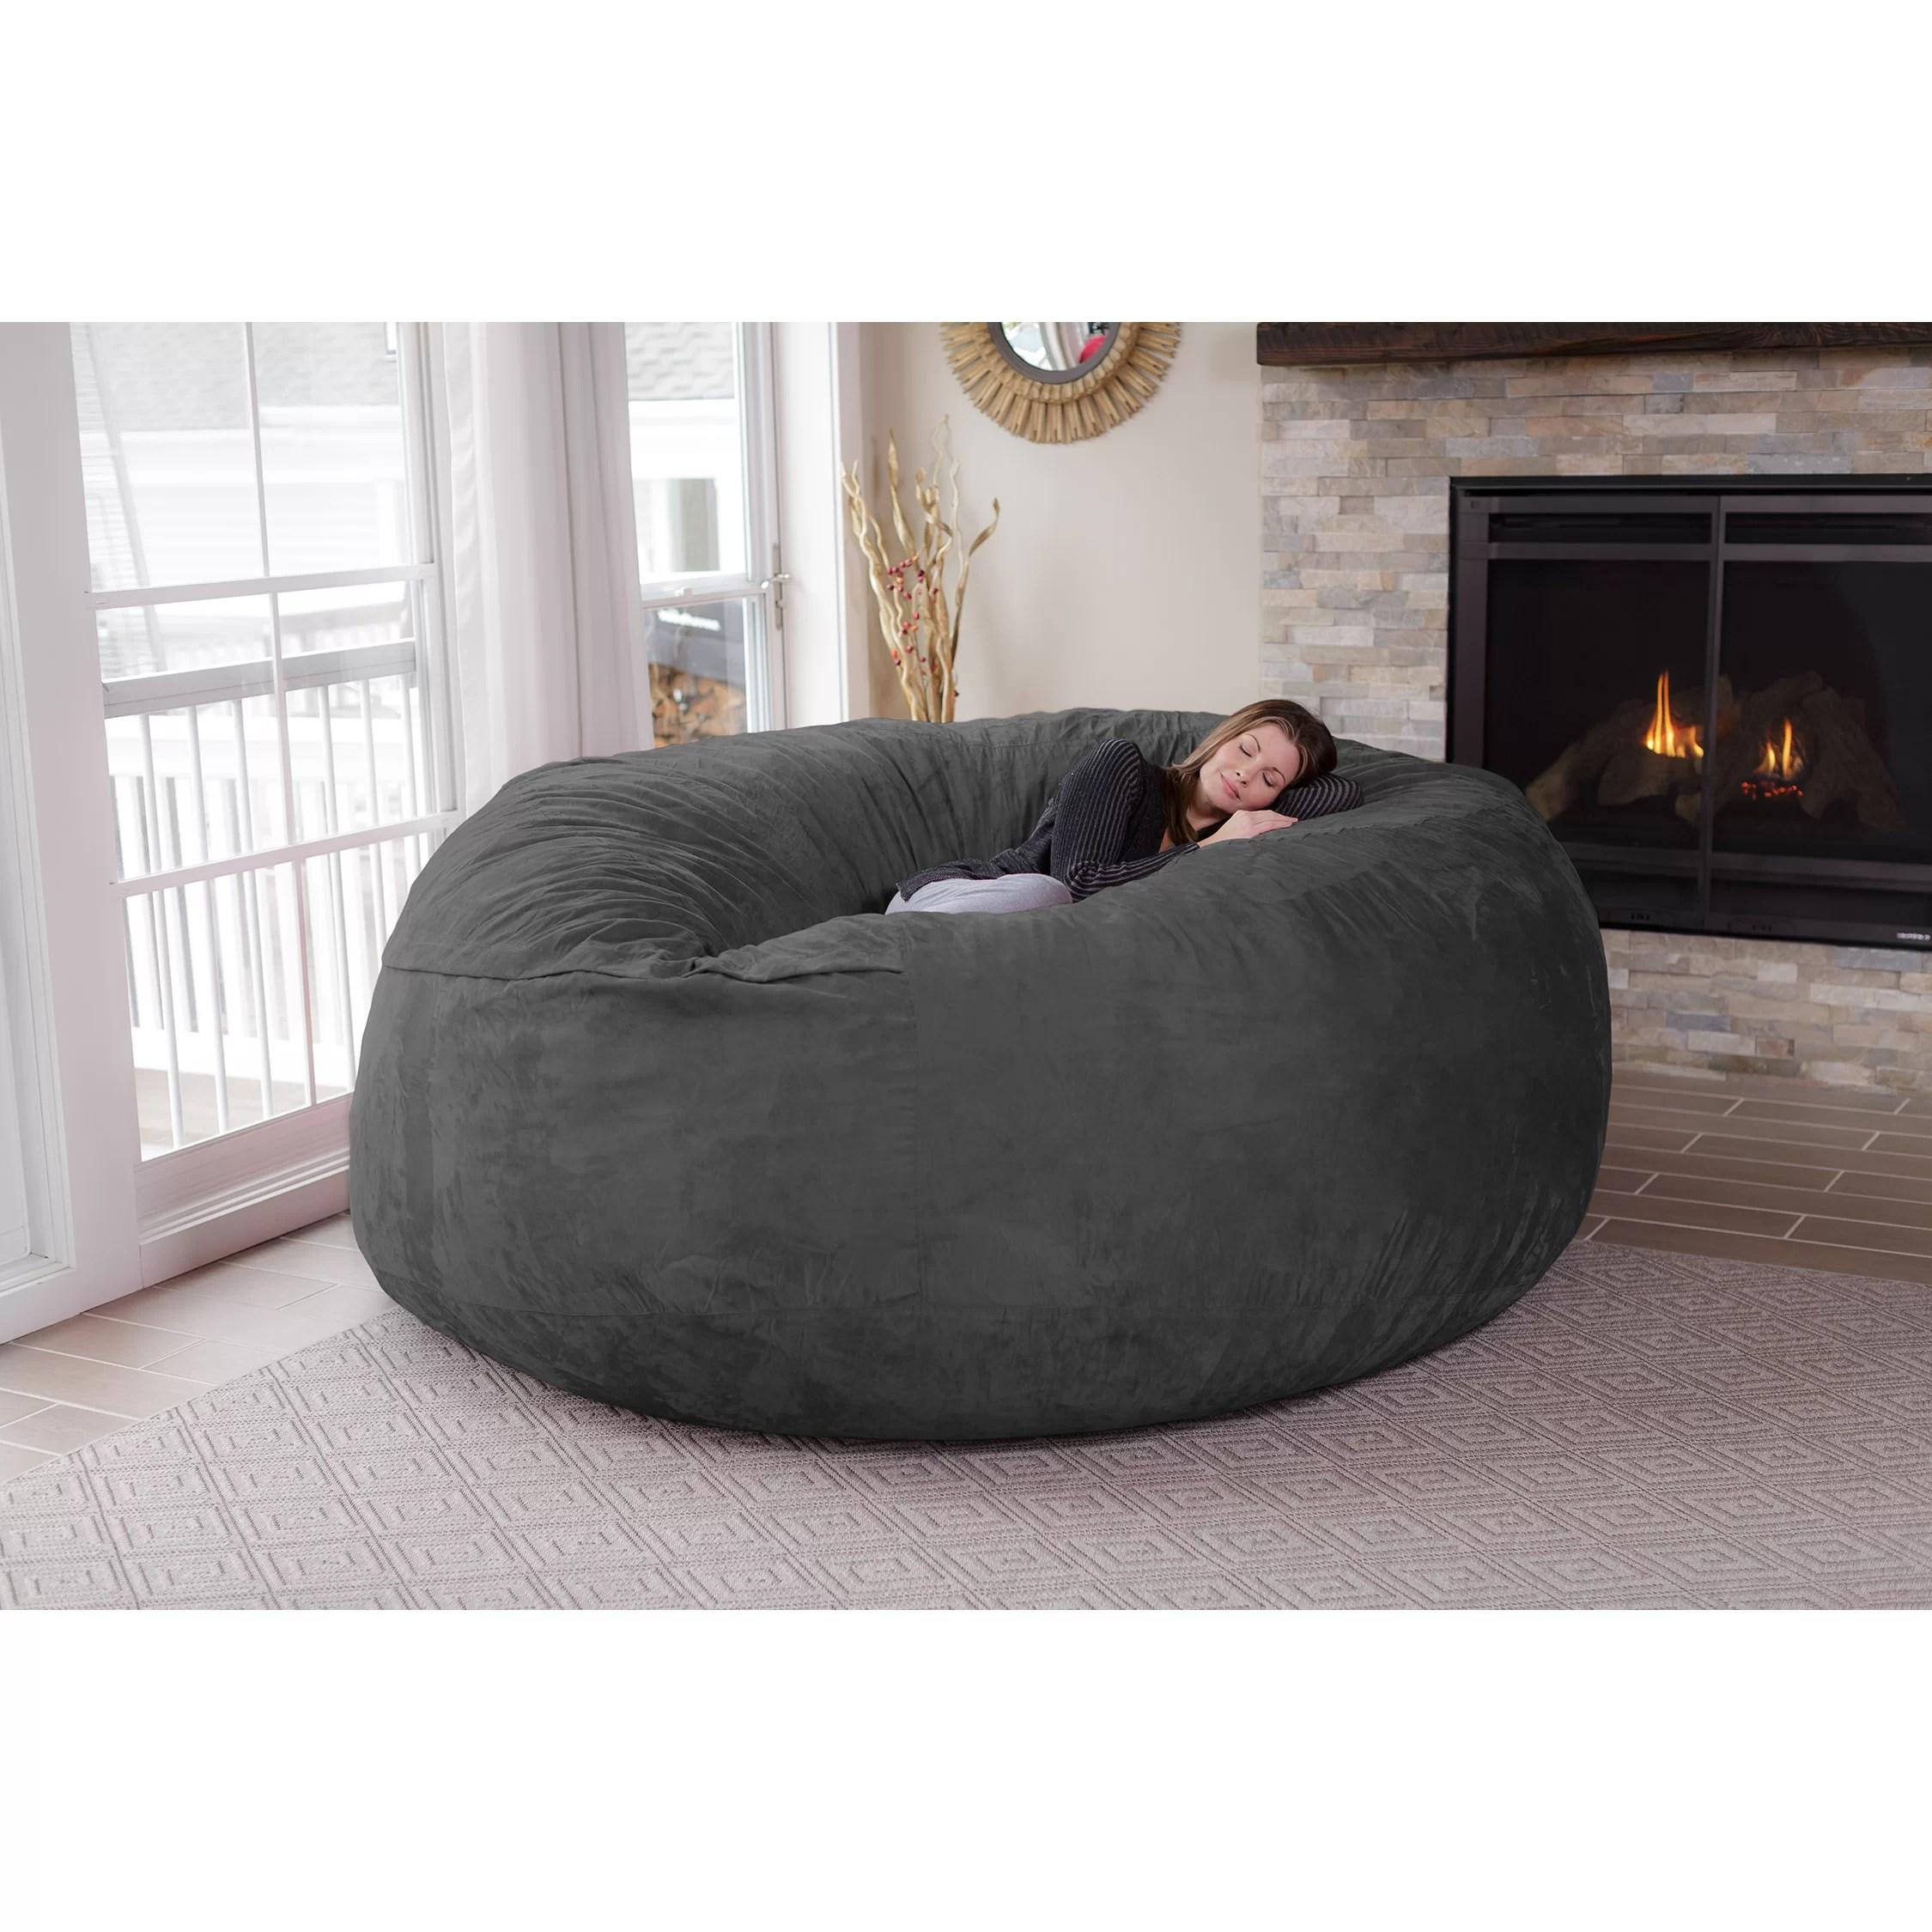 sofa sack reviews living room ideas with tan sofas theater sacks bean bag and wayfair